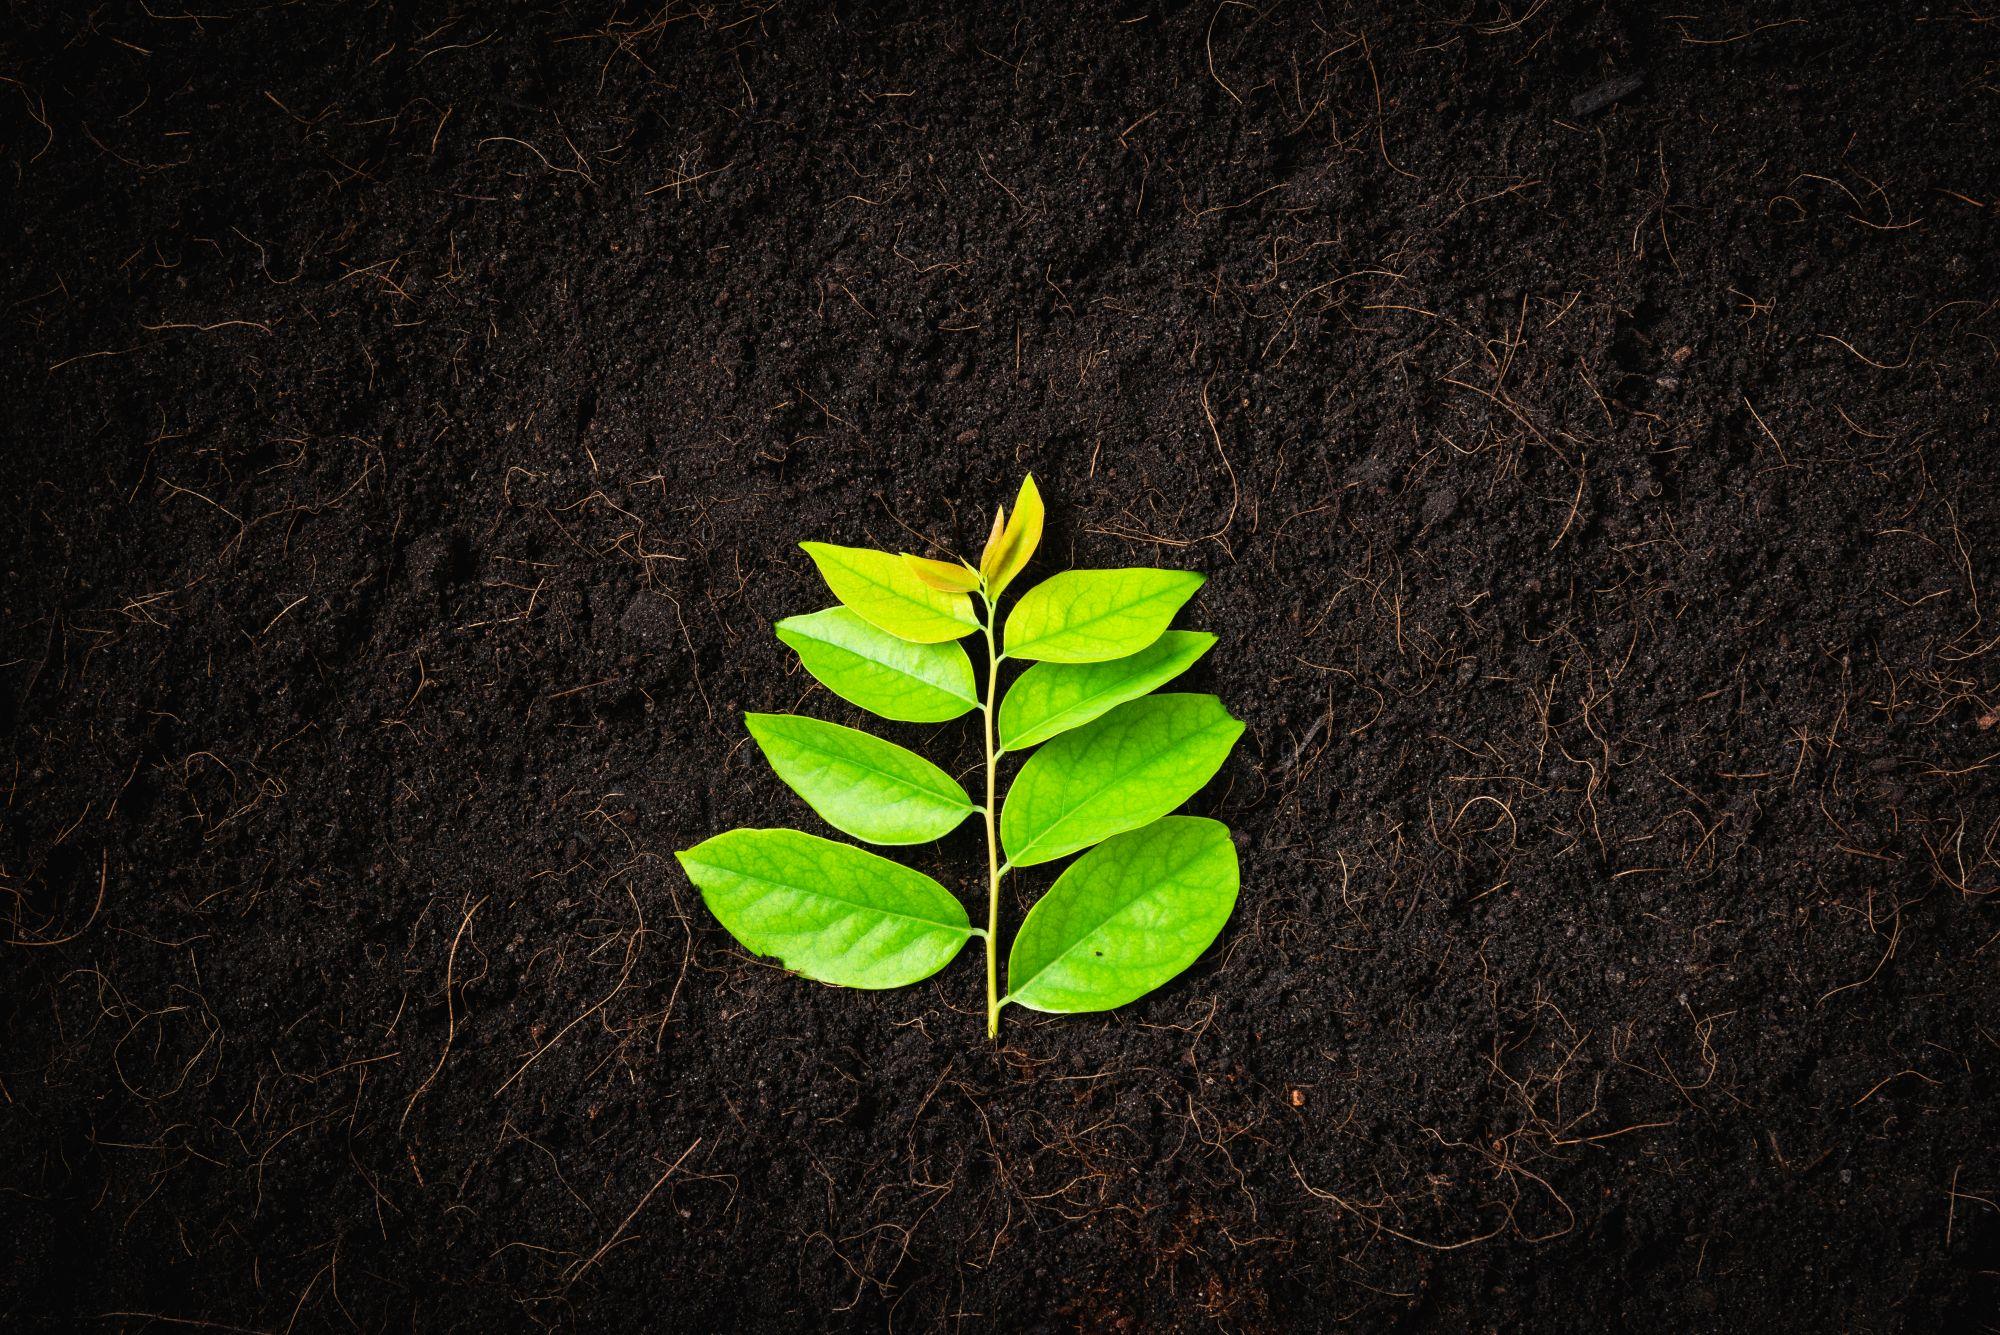 Zöld növény barna földön